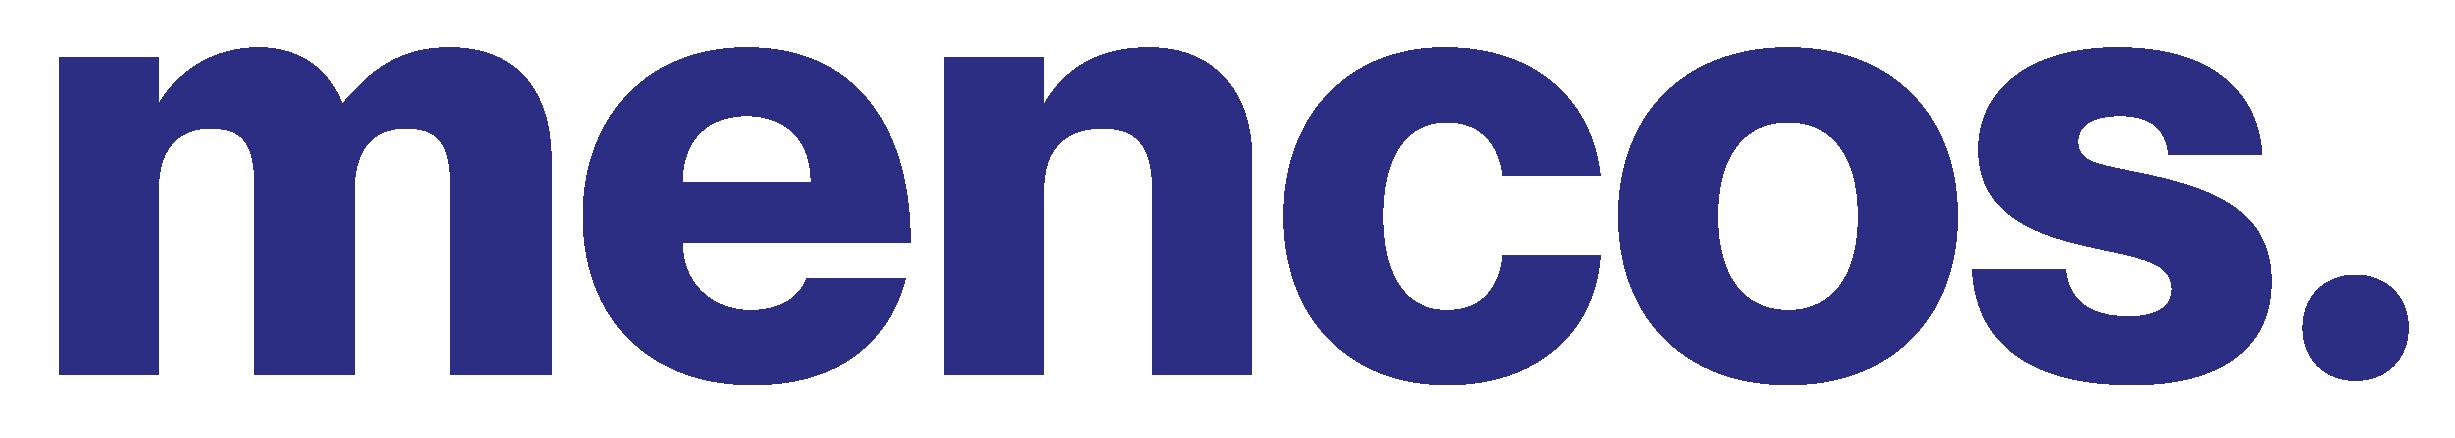 mencos.(メンコス)|メンズコスメの総合サイト